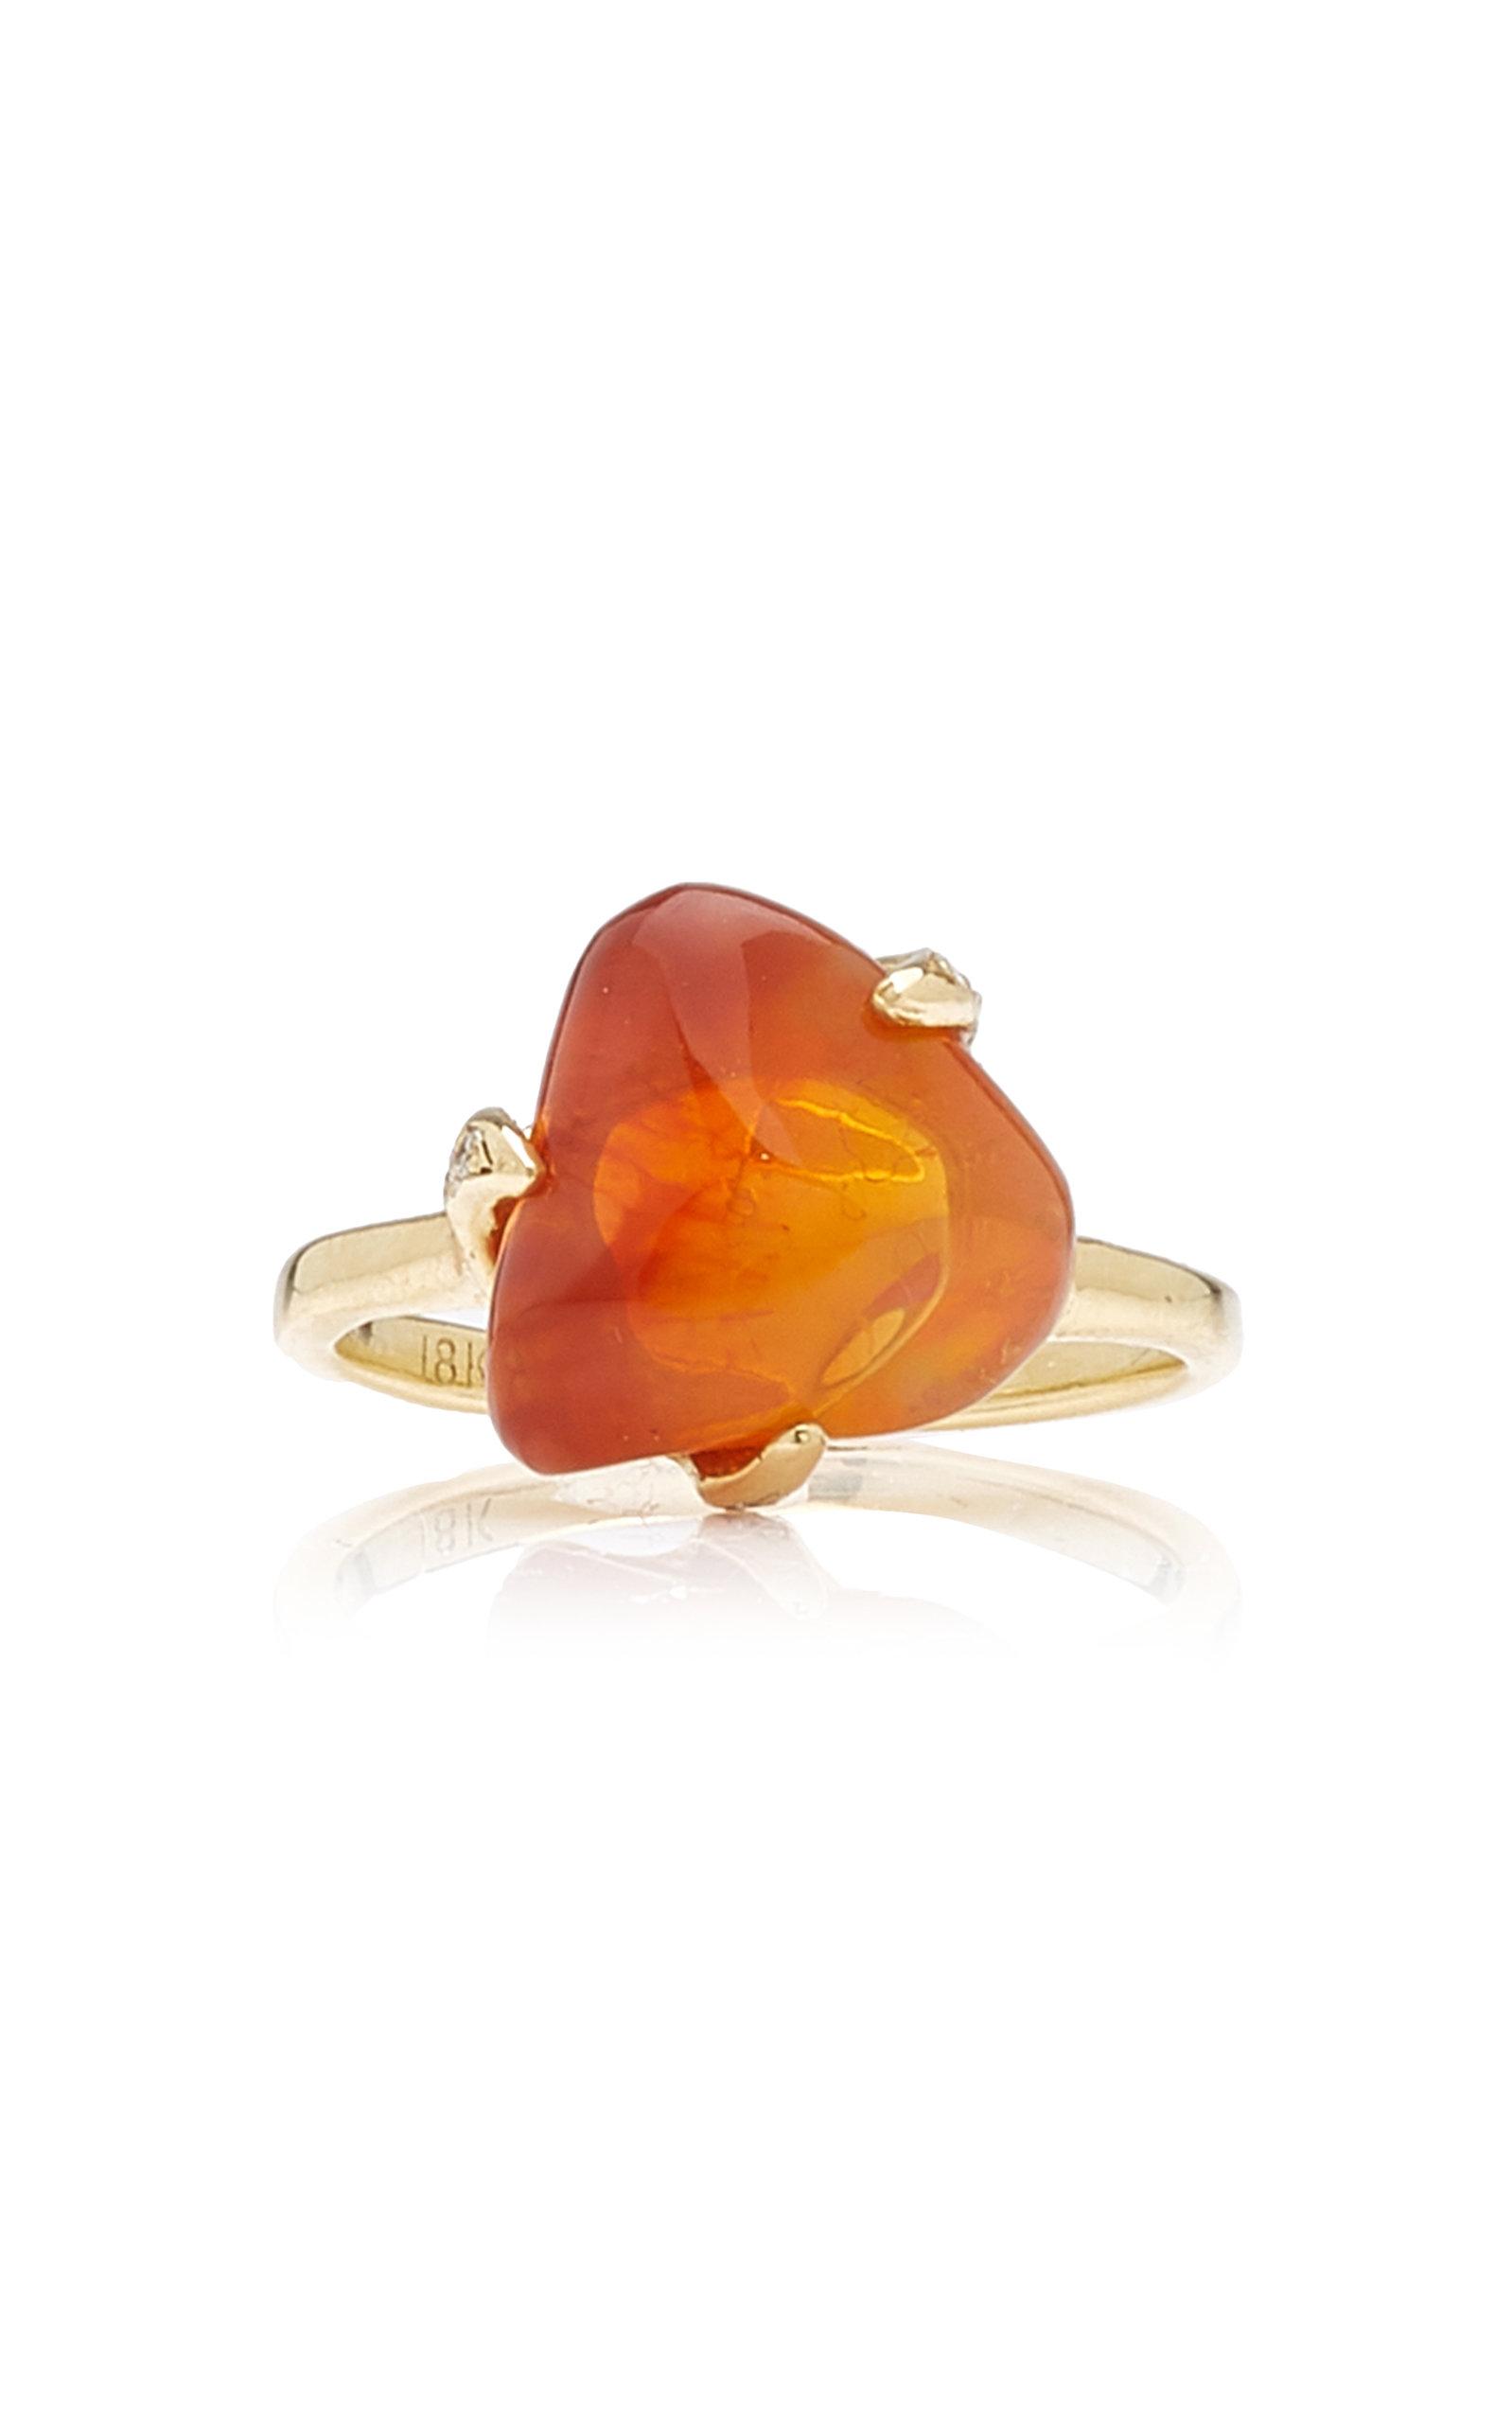 M.Spalten - Women's Tumbled Opal 18K Yellow Gold Ring - Orange - Moda Operandi